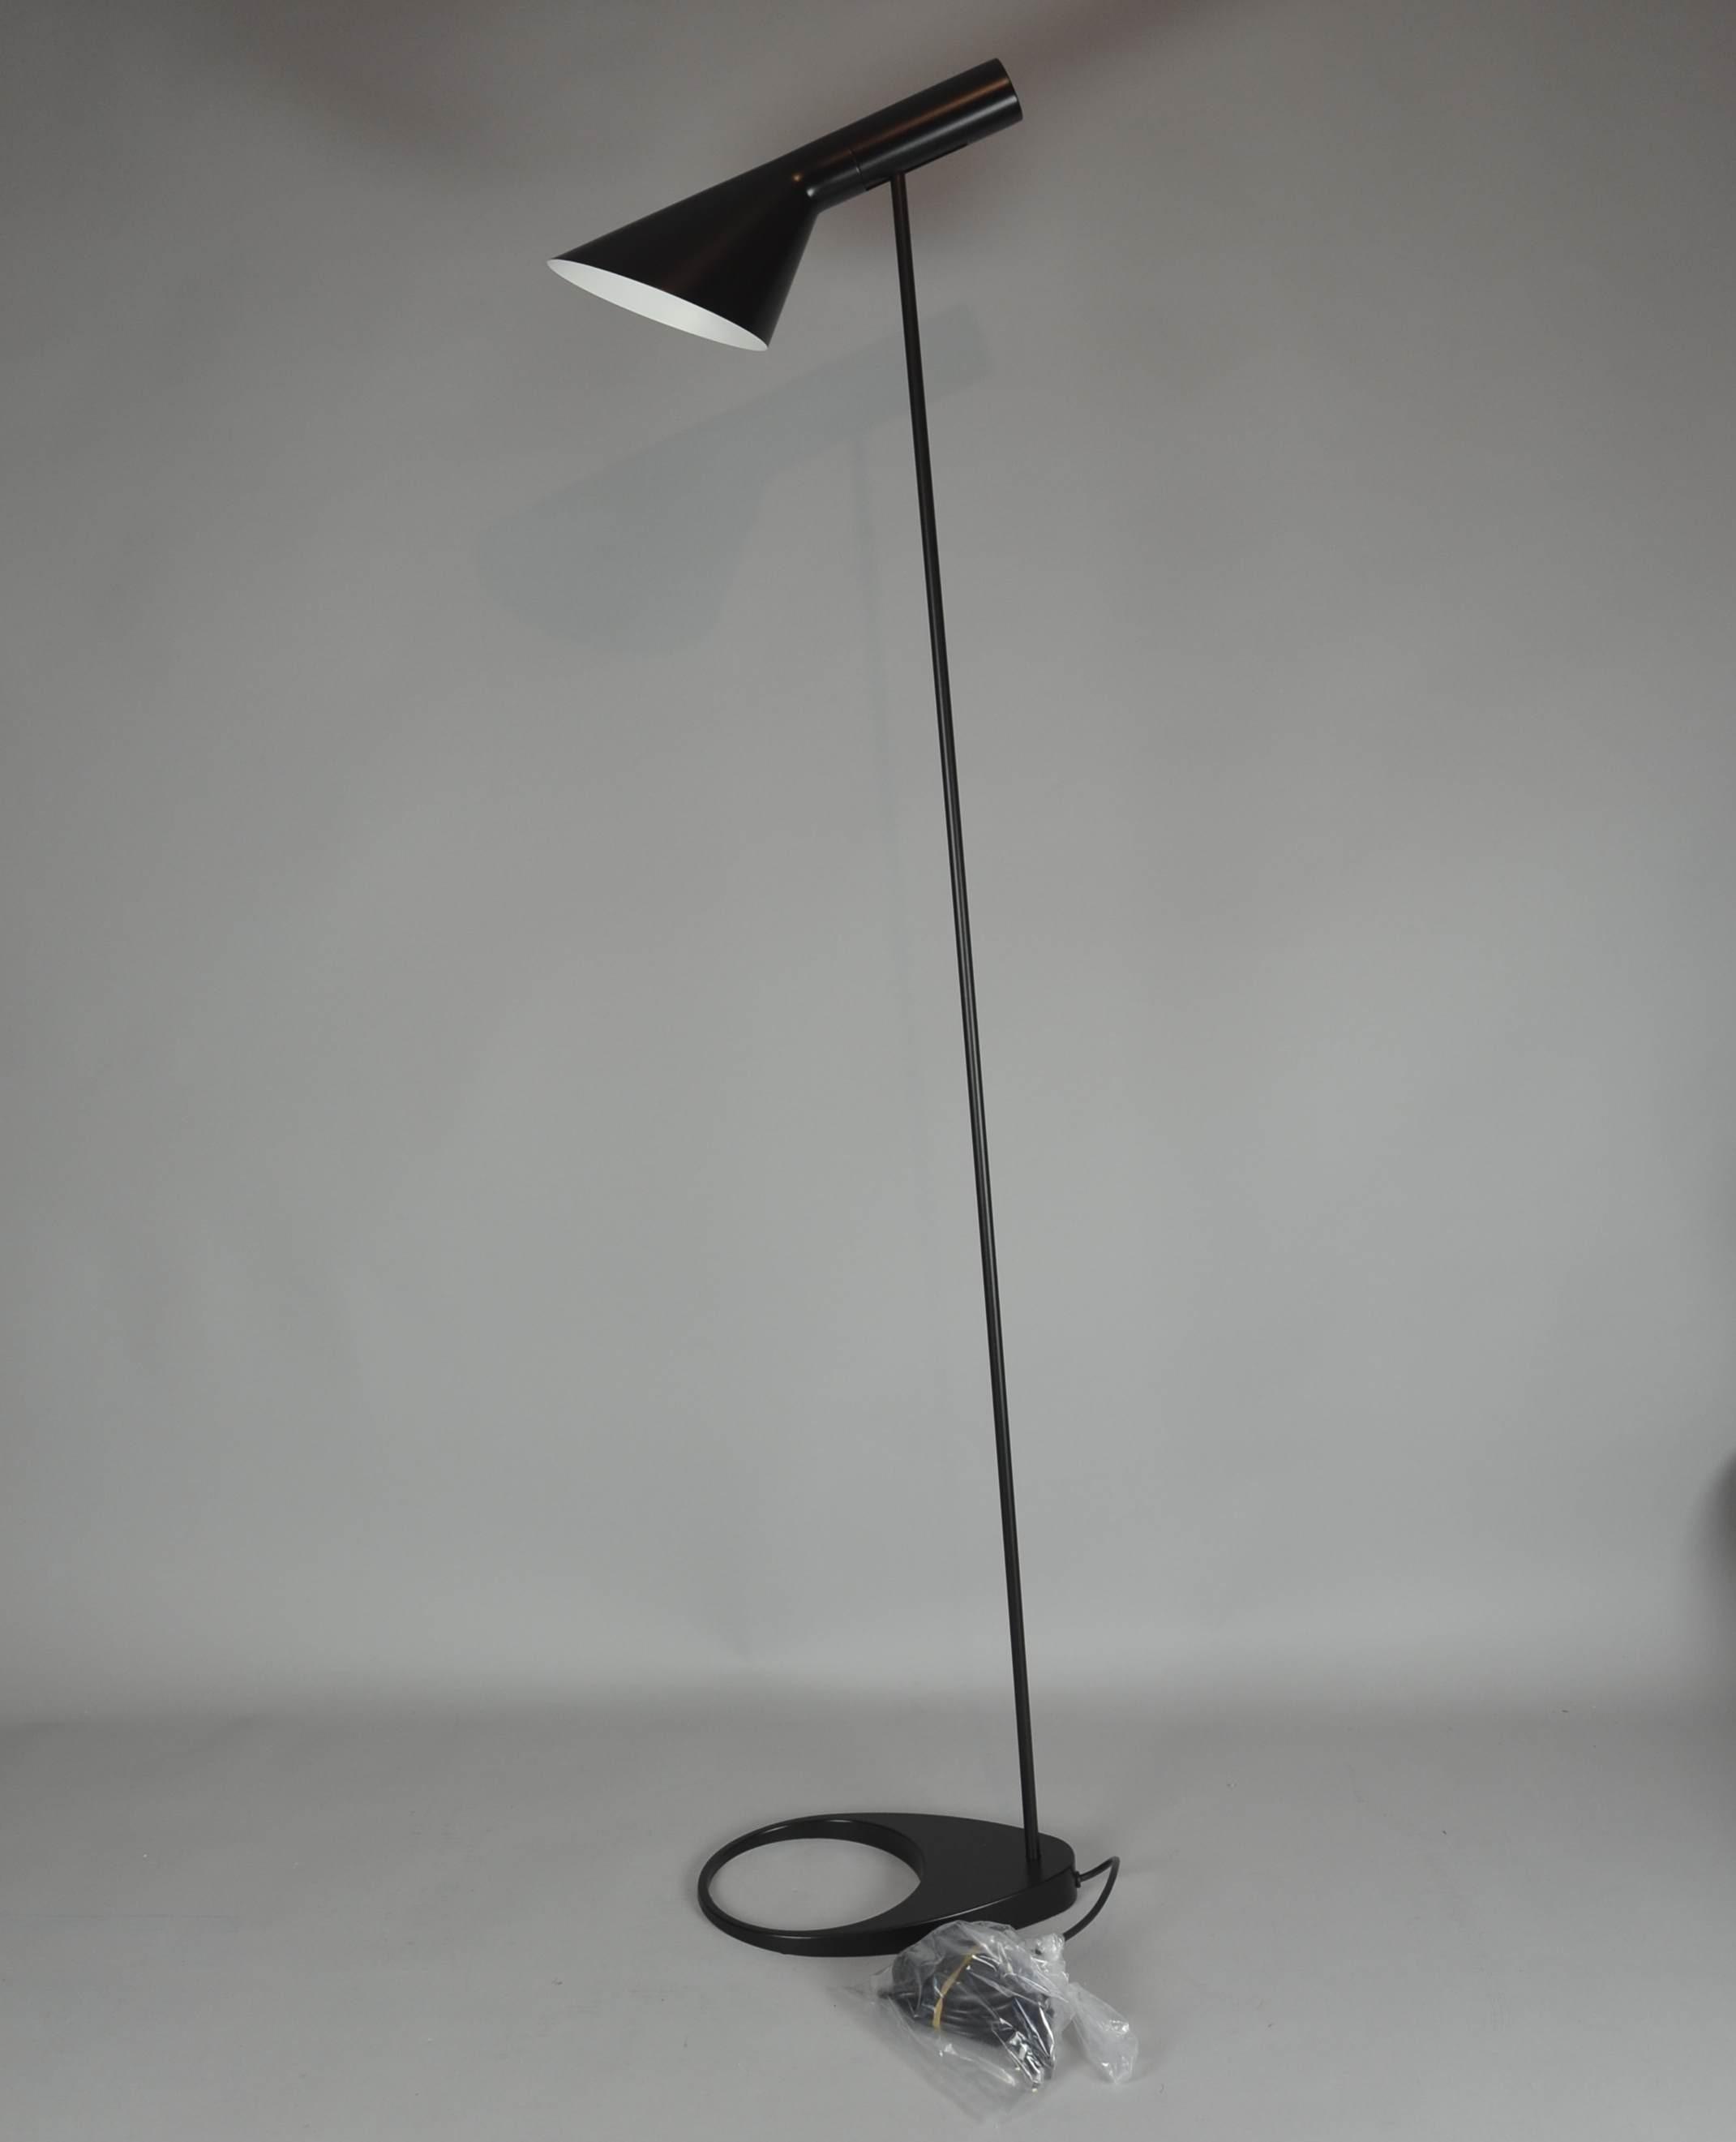 Arne Jacobsen Stehlampe Fur Louis Poulsen Lighting Lamps